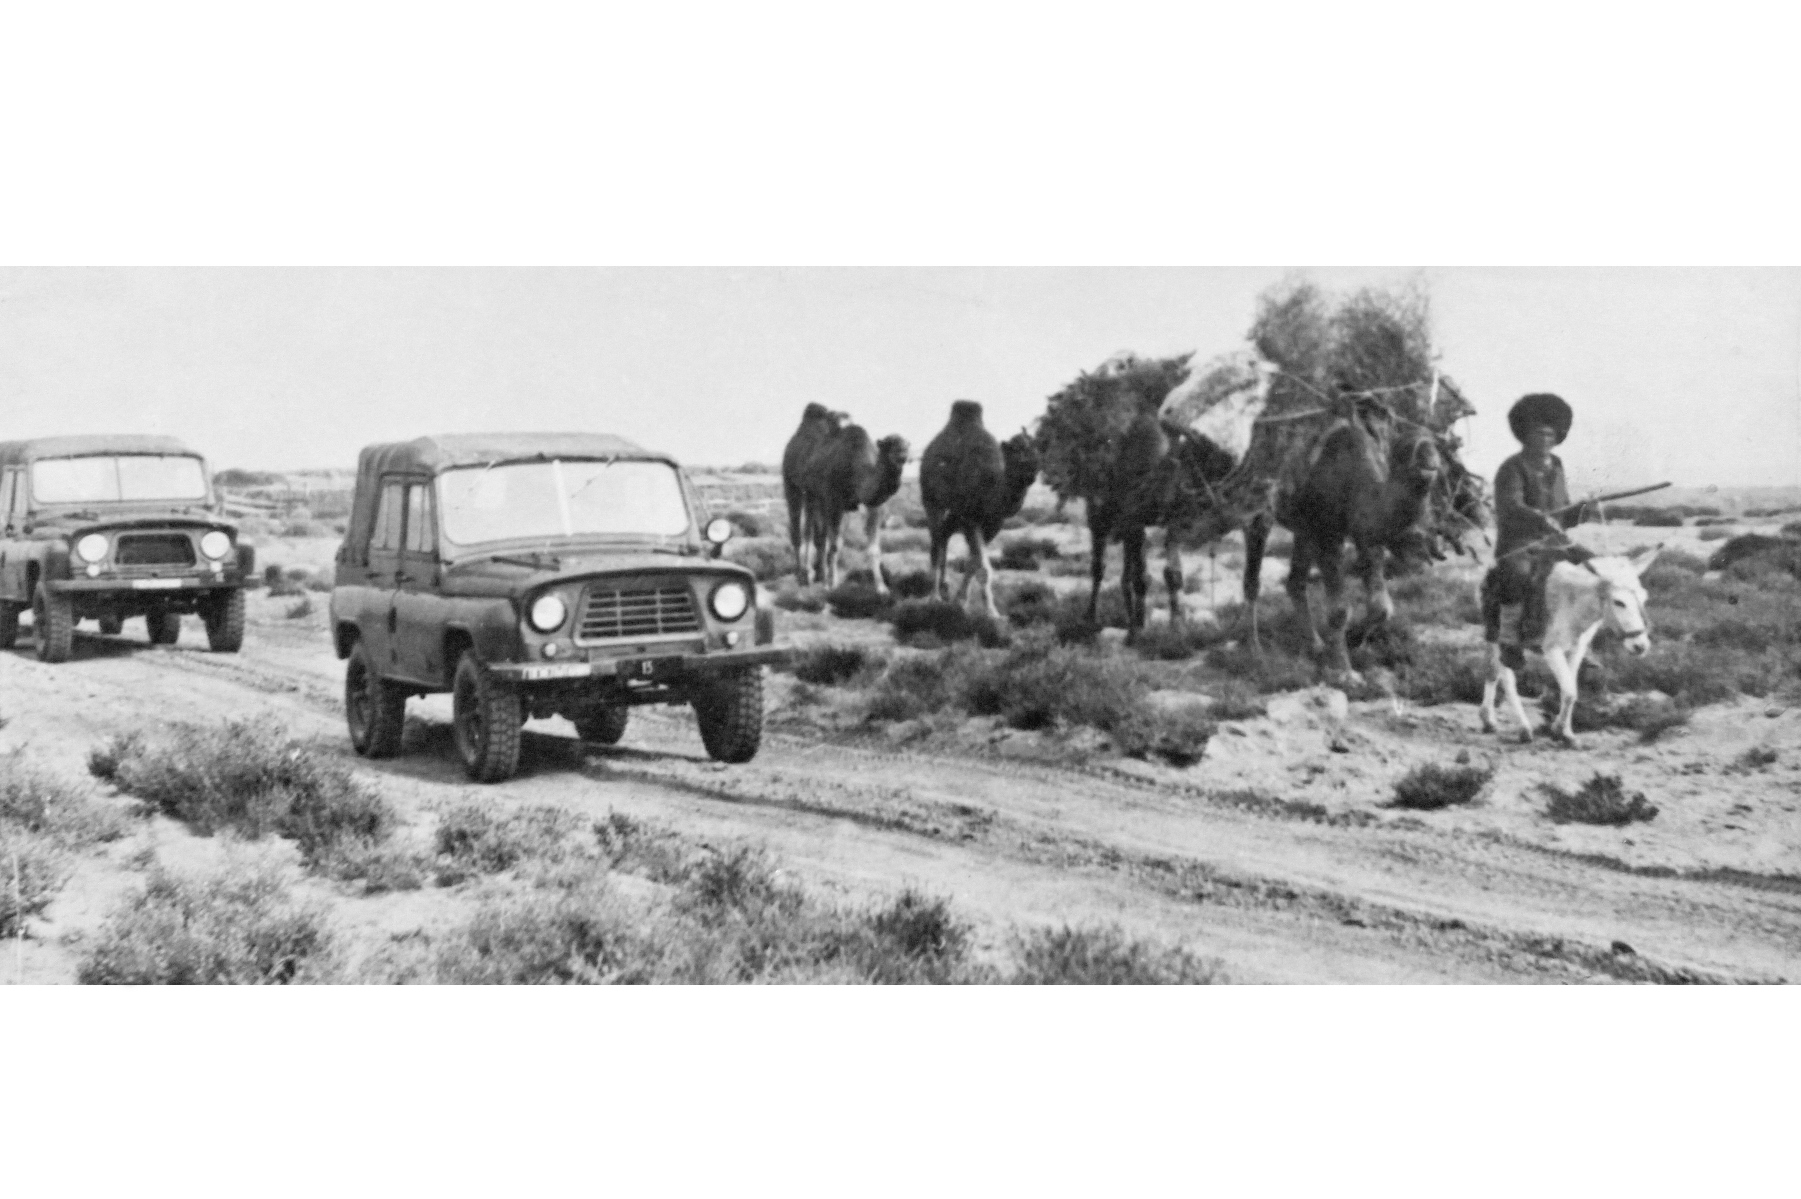 Юбилей легенды бездорожья: 45 лет УАЗ-469